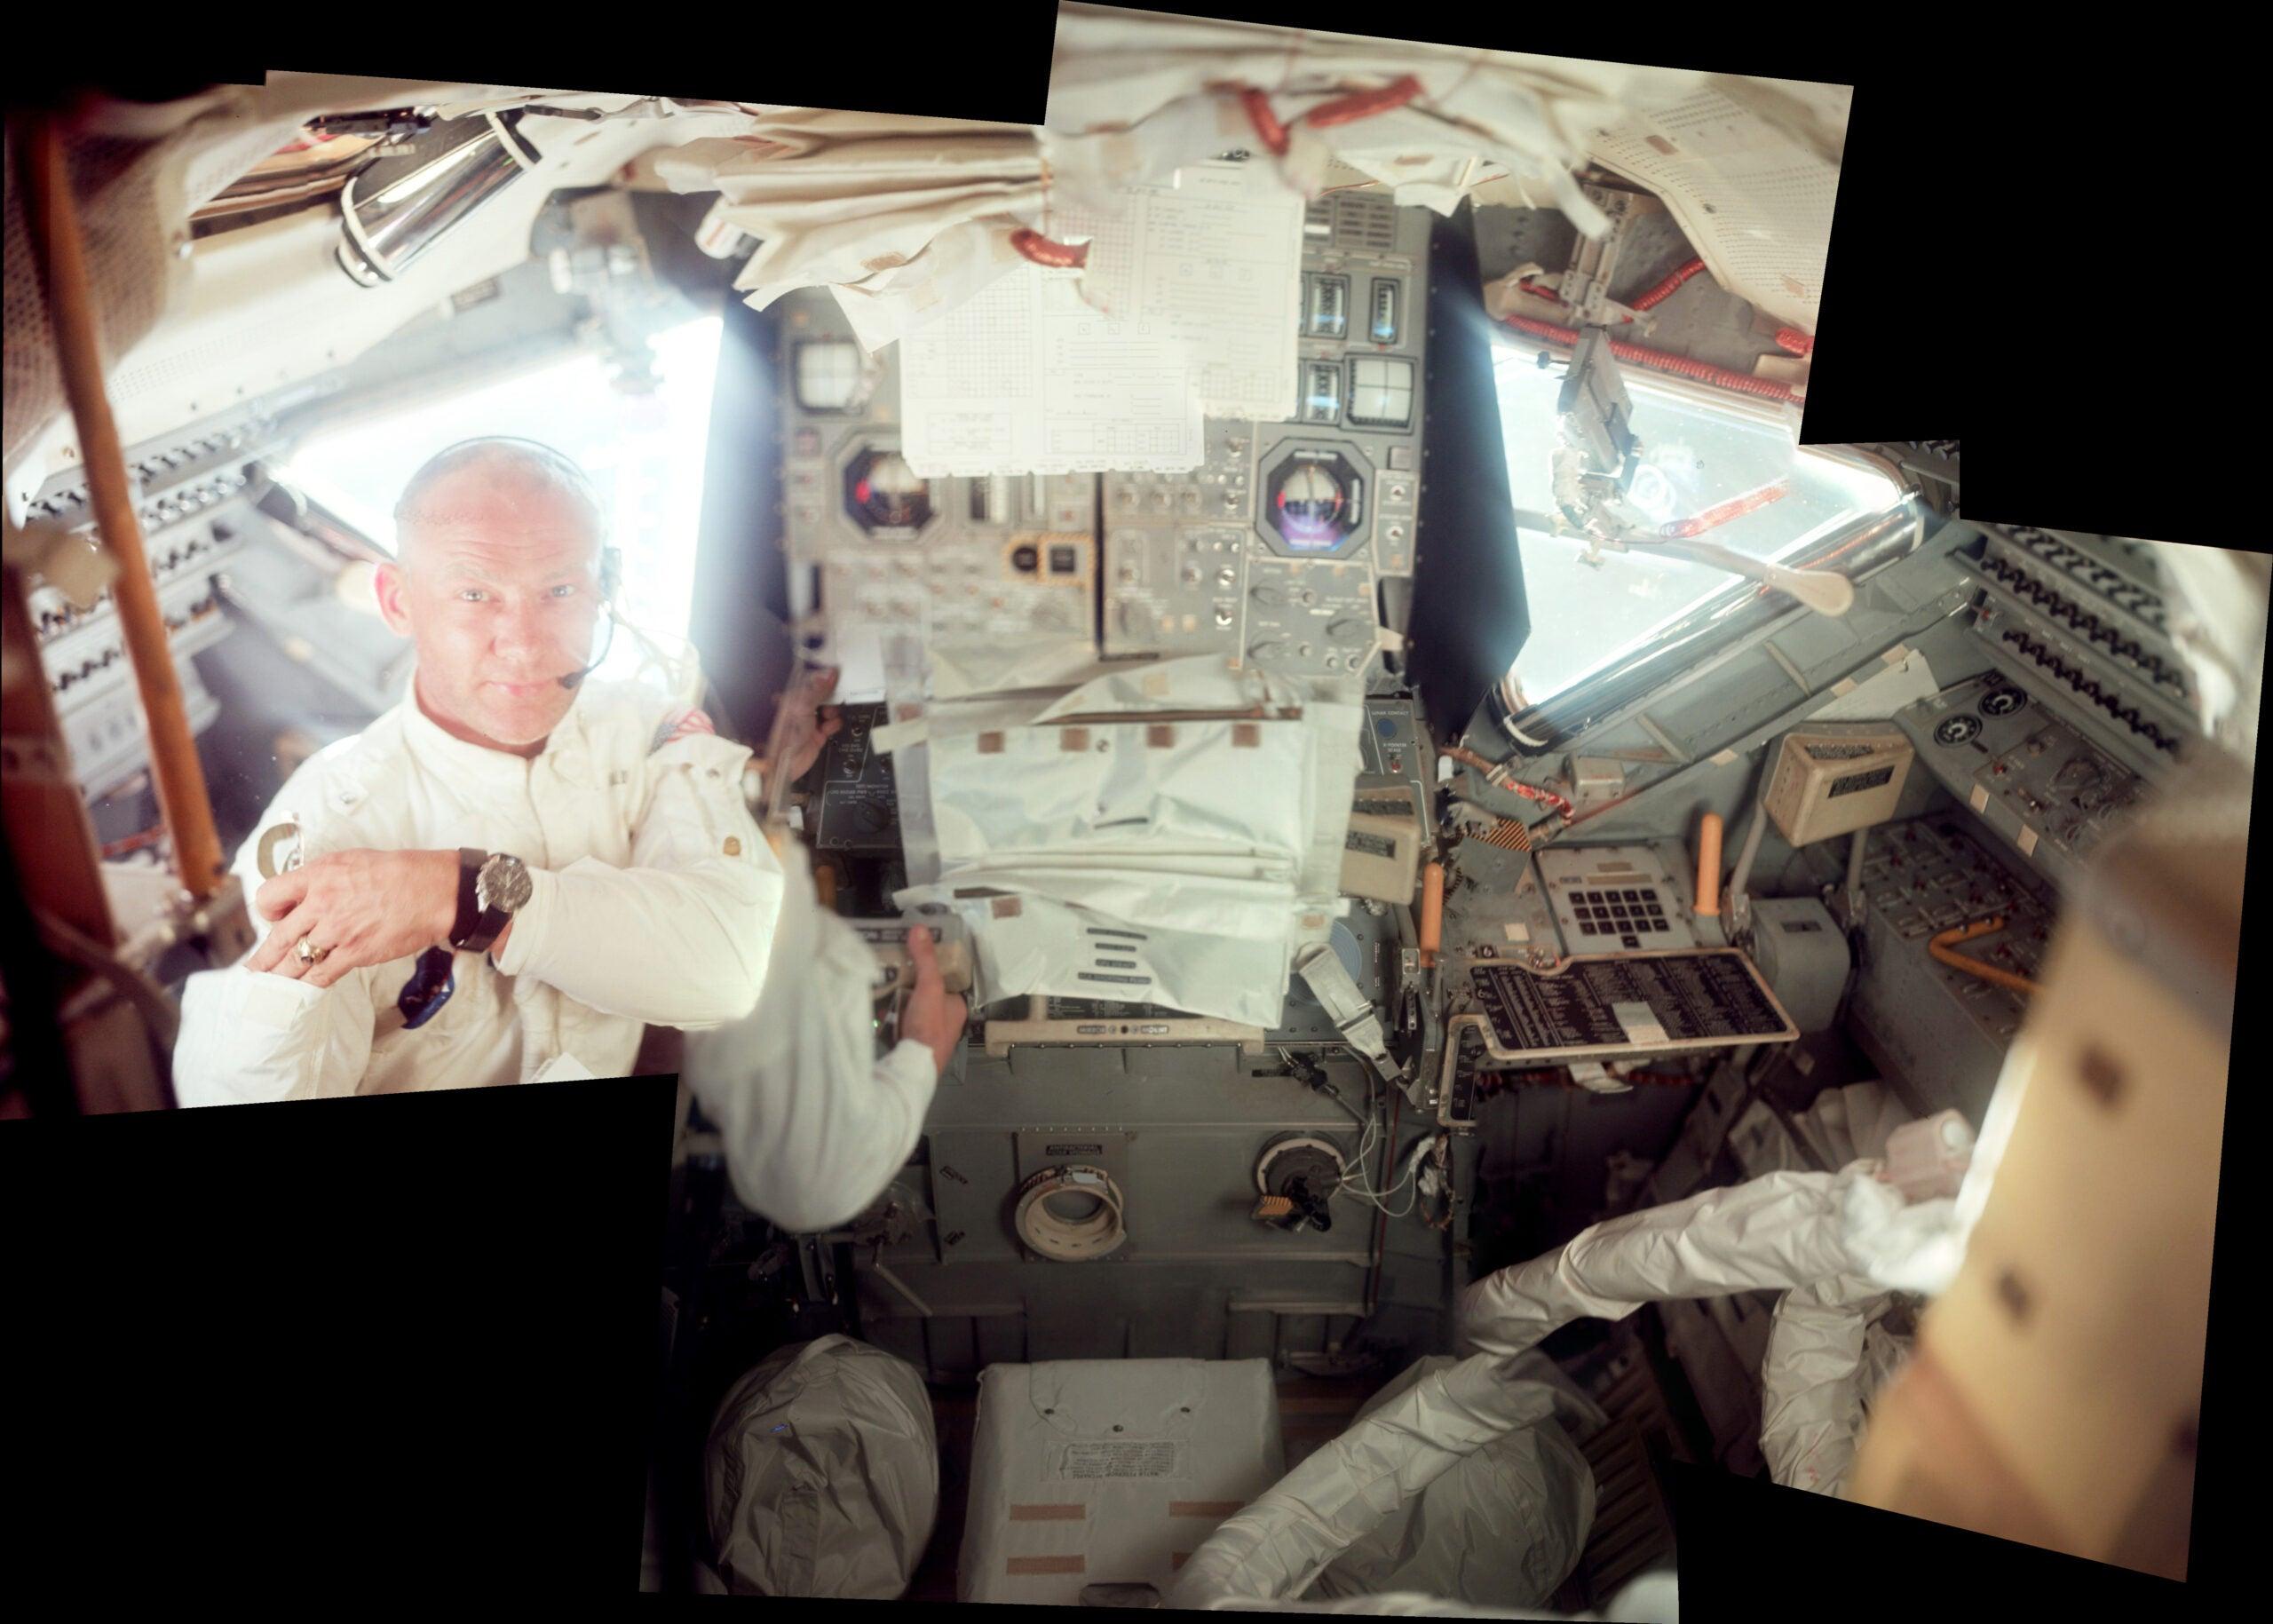 Seeing Inside The Apollo Lunar Module